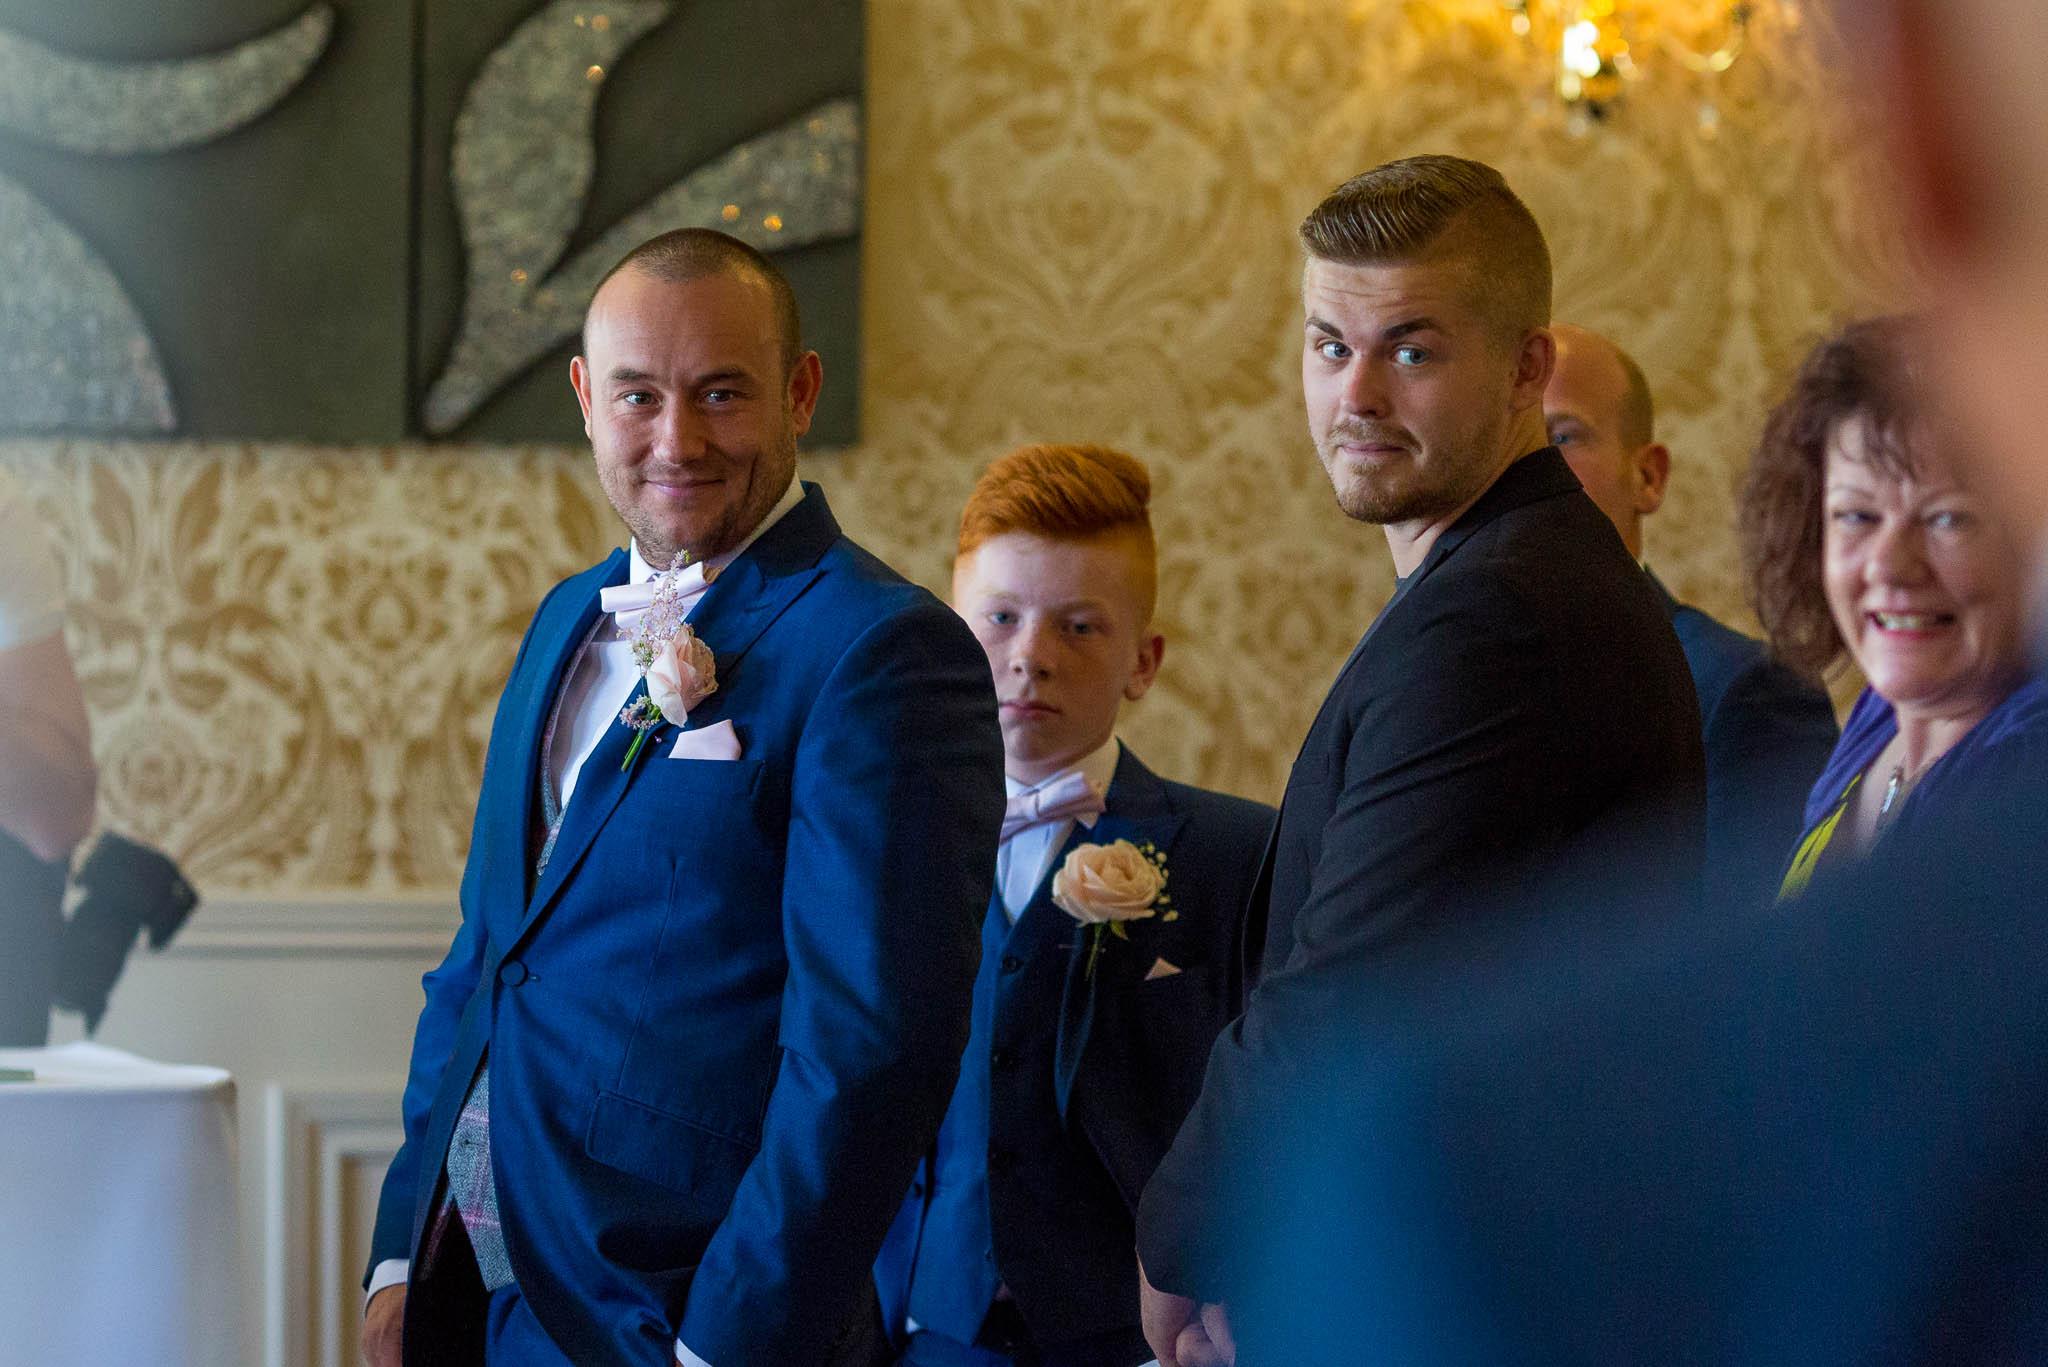 Darrington Golf Club Wedding Photographer56.jpg